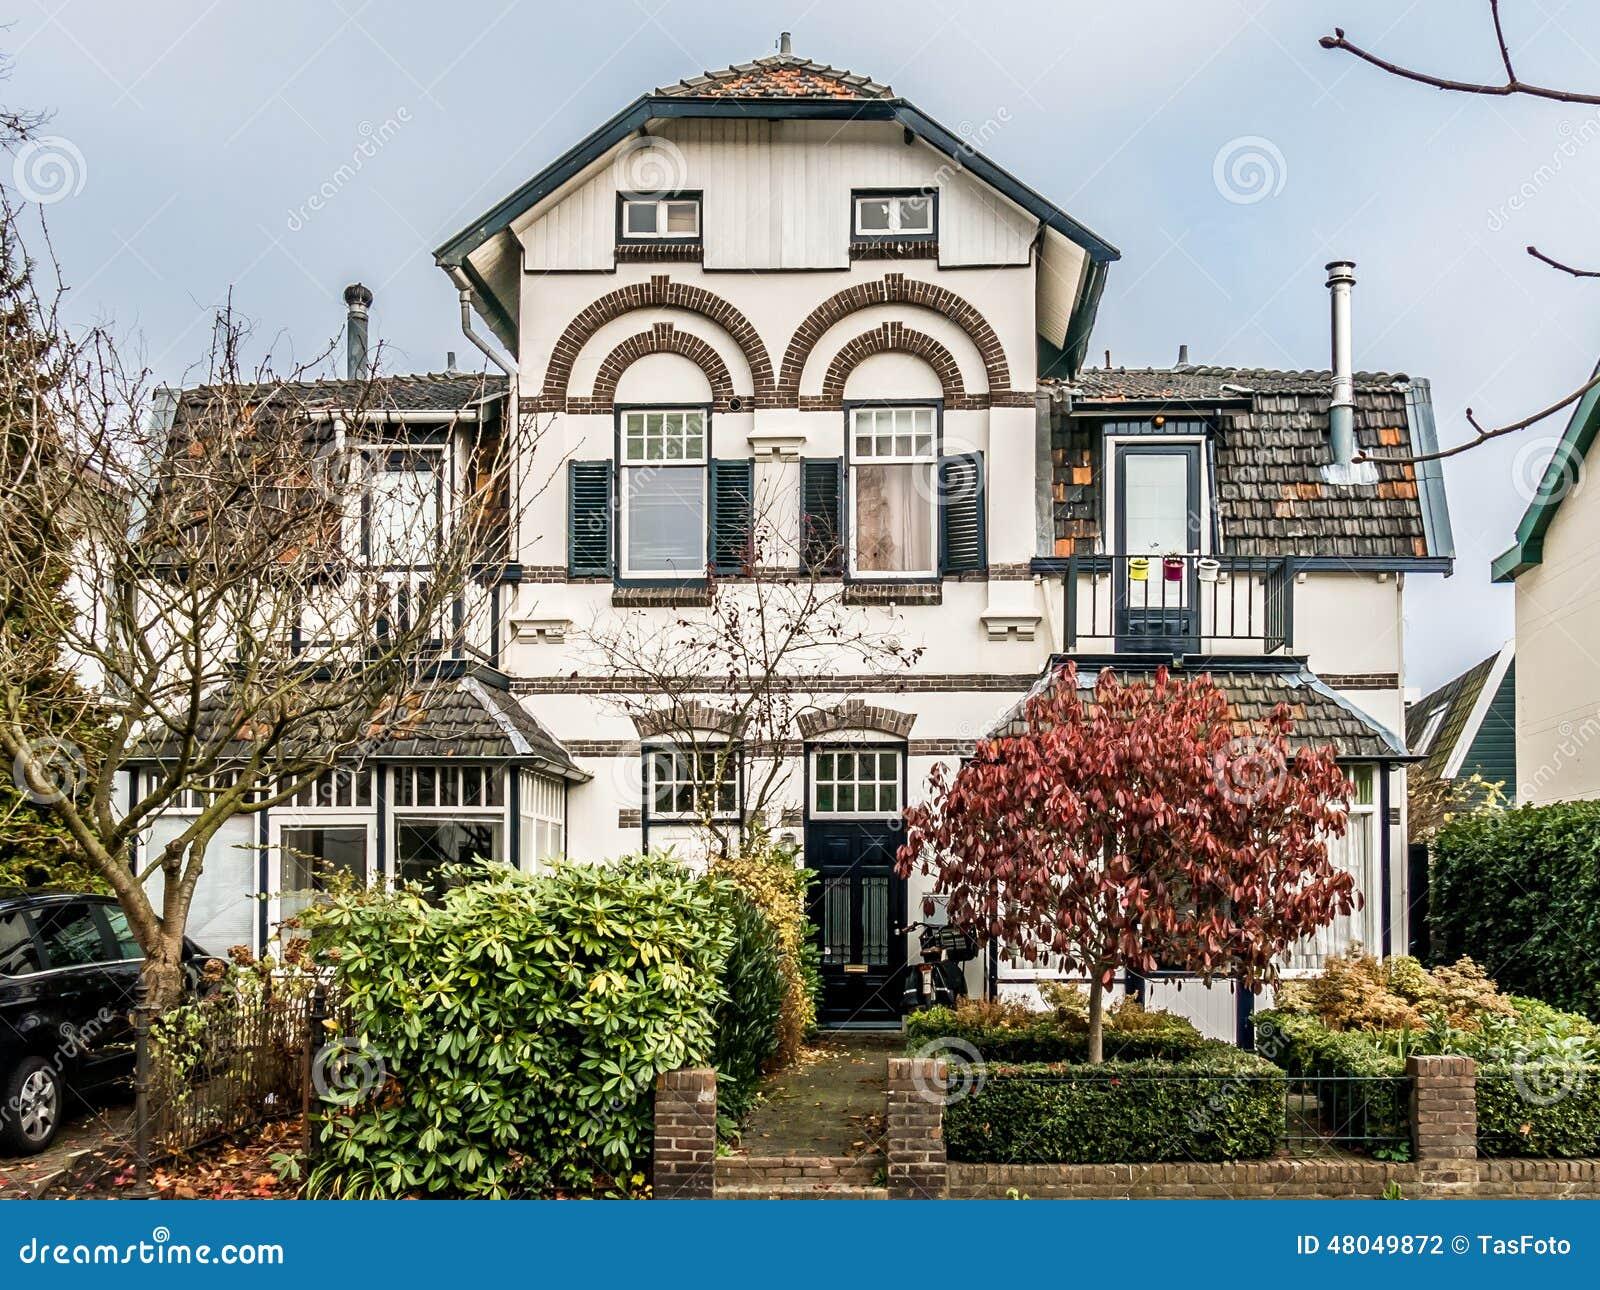 Oud huis in hilversum holland redactionele fotografie afbeelding 48049872 - Foto huis in l ...